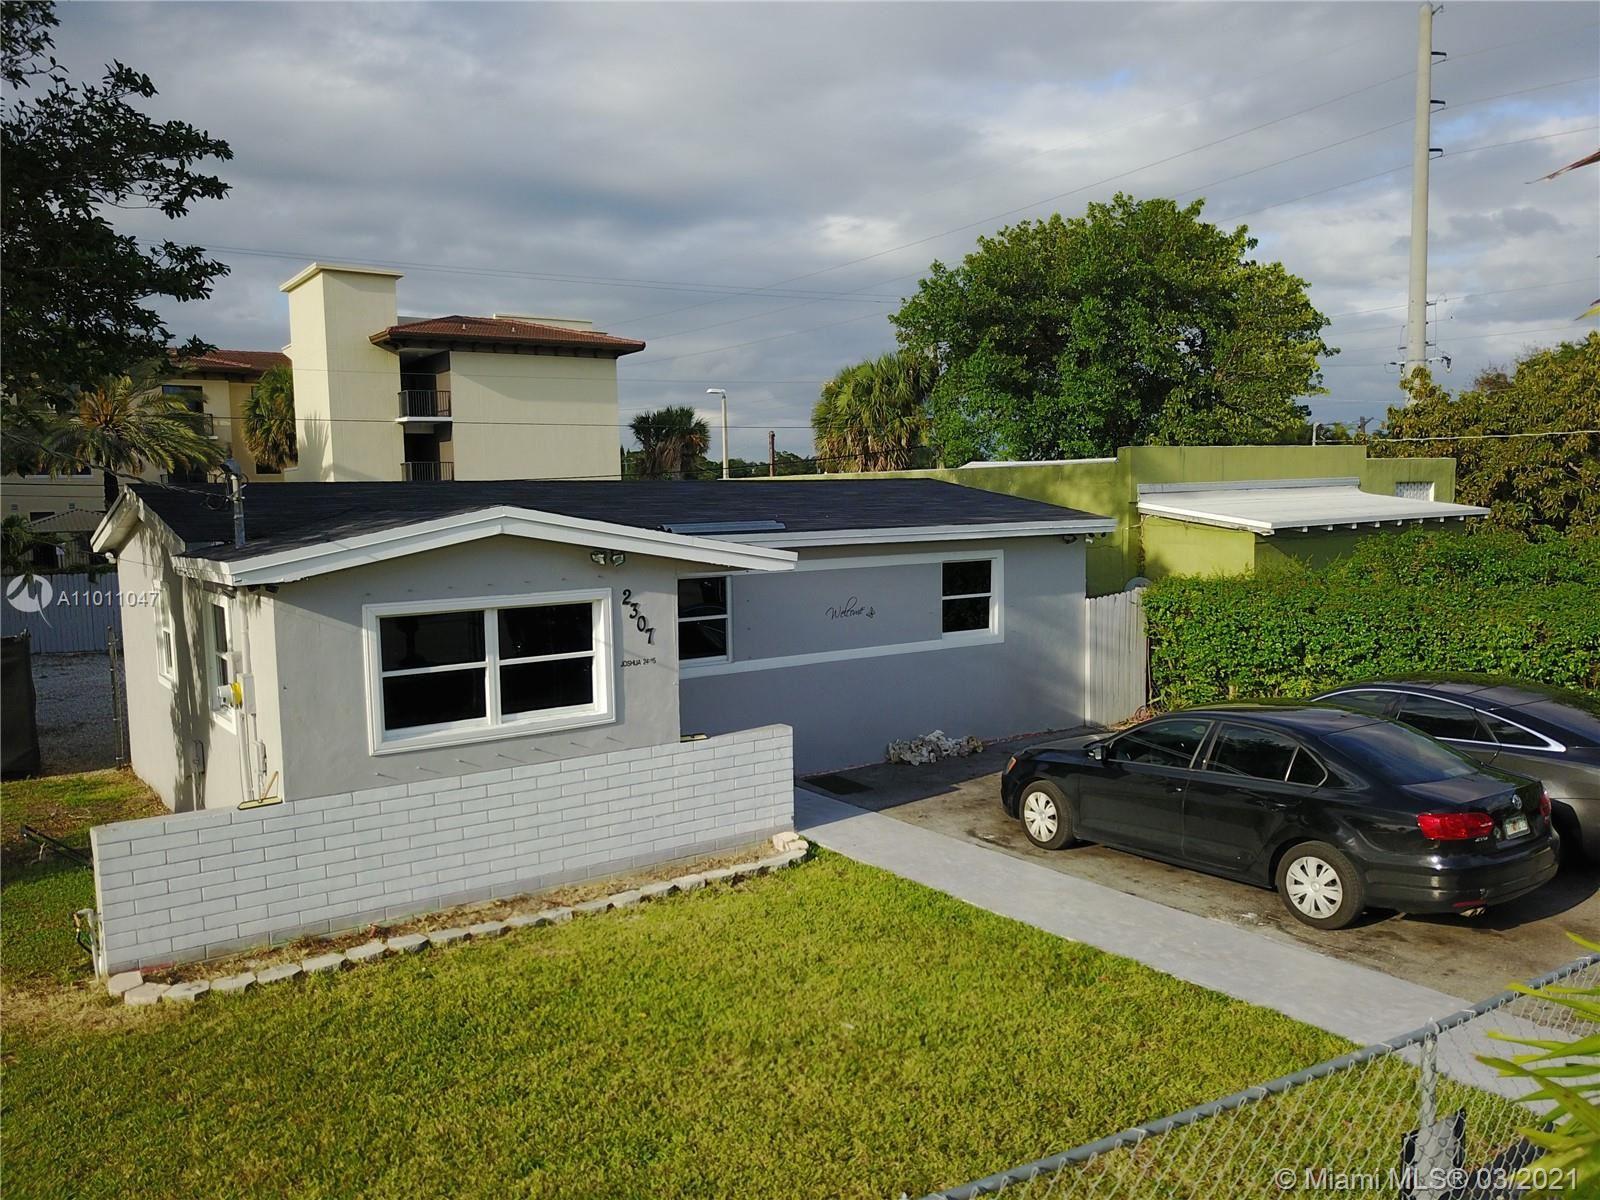 2307 NW 61st St, Miami, FL 33142 - #: A11011047